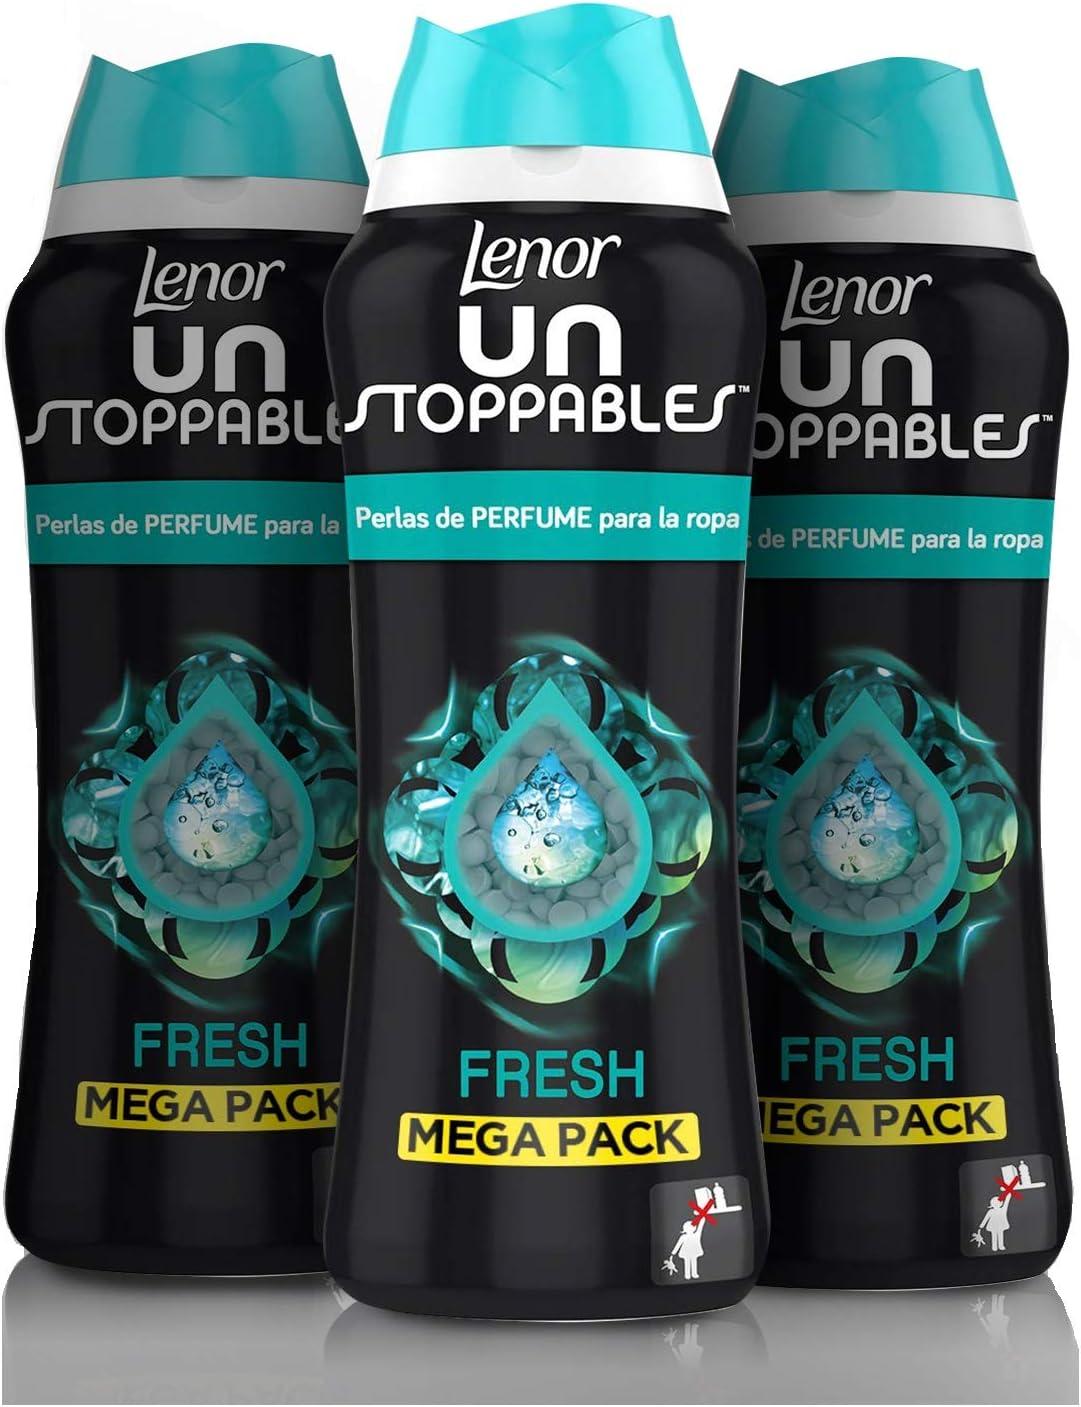 Lenor UNstoppables Fresh Perlas de Perfume para la ropa, 510 g, Pack x3